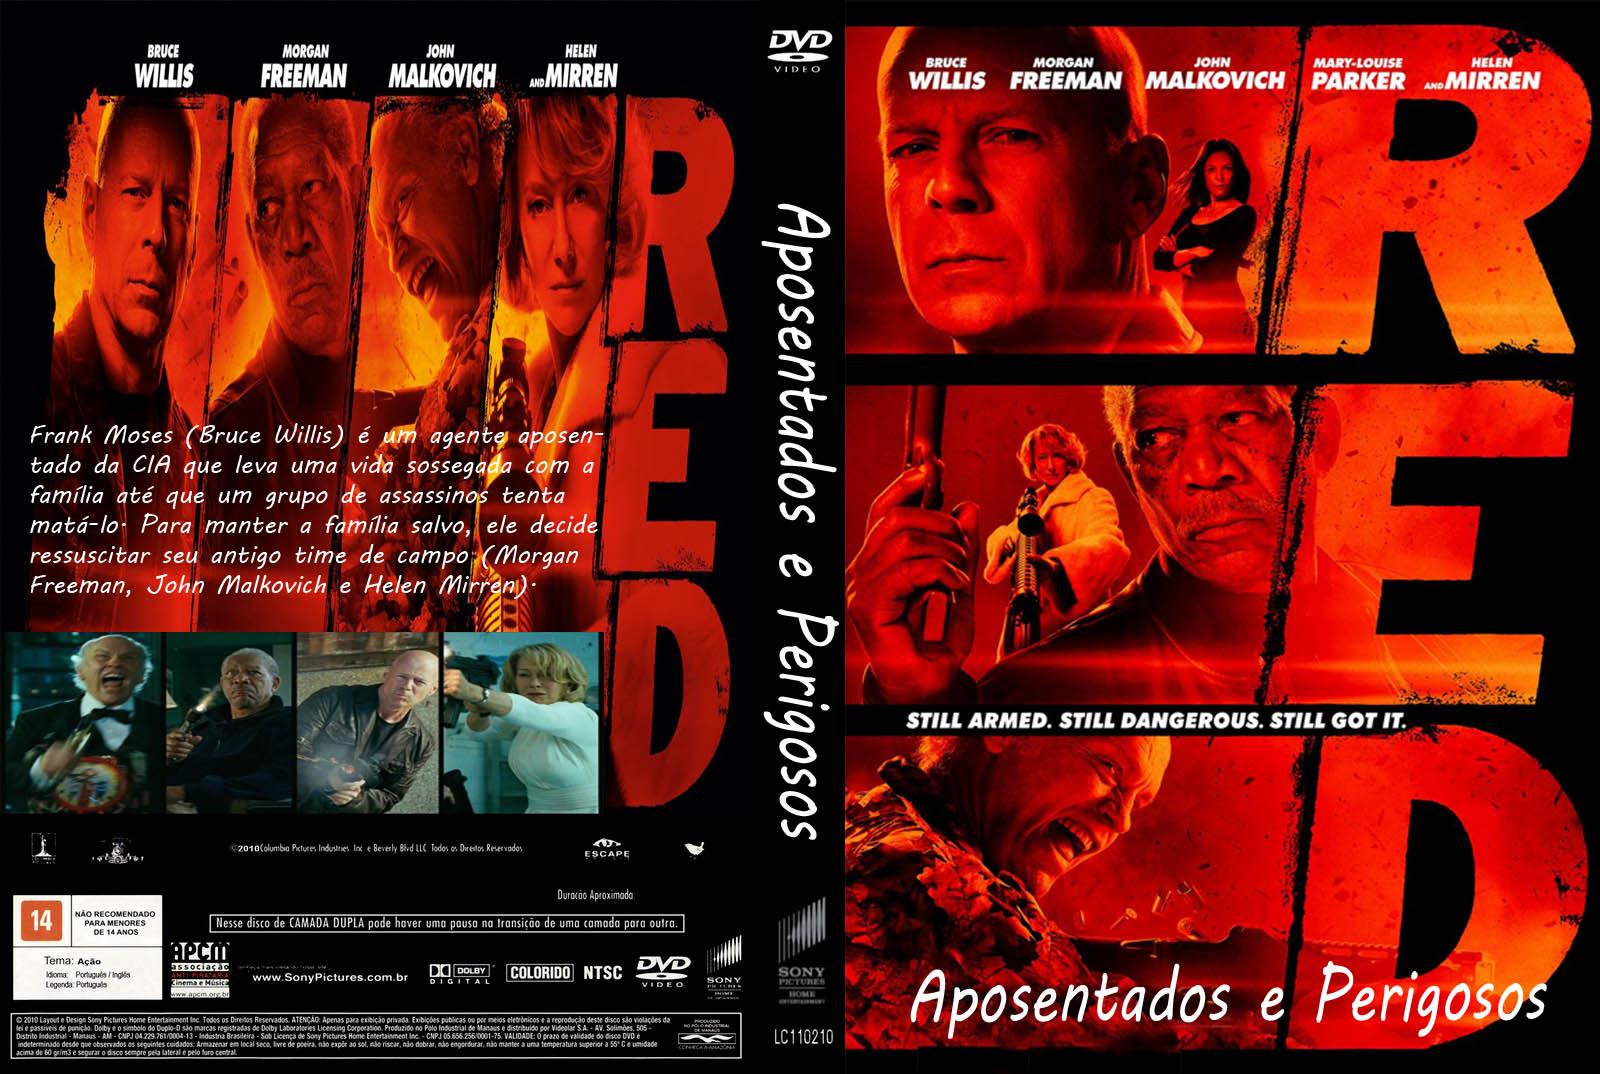 http://2.bp.blogspot.com/_kr399wN1bAc/TNSehM8f9gI/AAAAAAAAAJA/fDk5XFBtFNs/s1600/Red+-+Aposentados+e+Perigosos.jpg